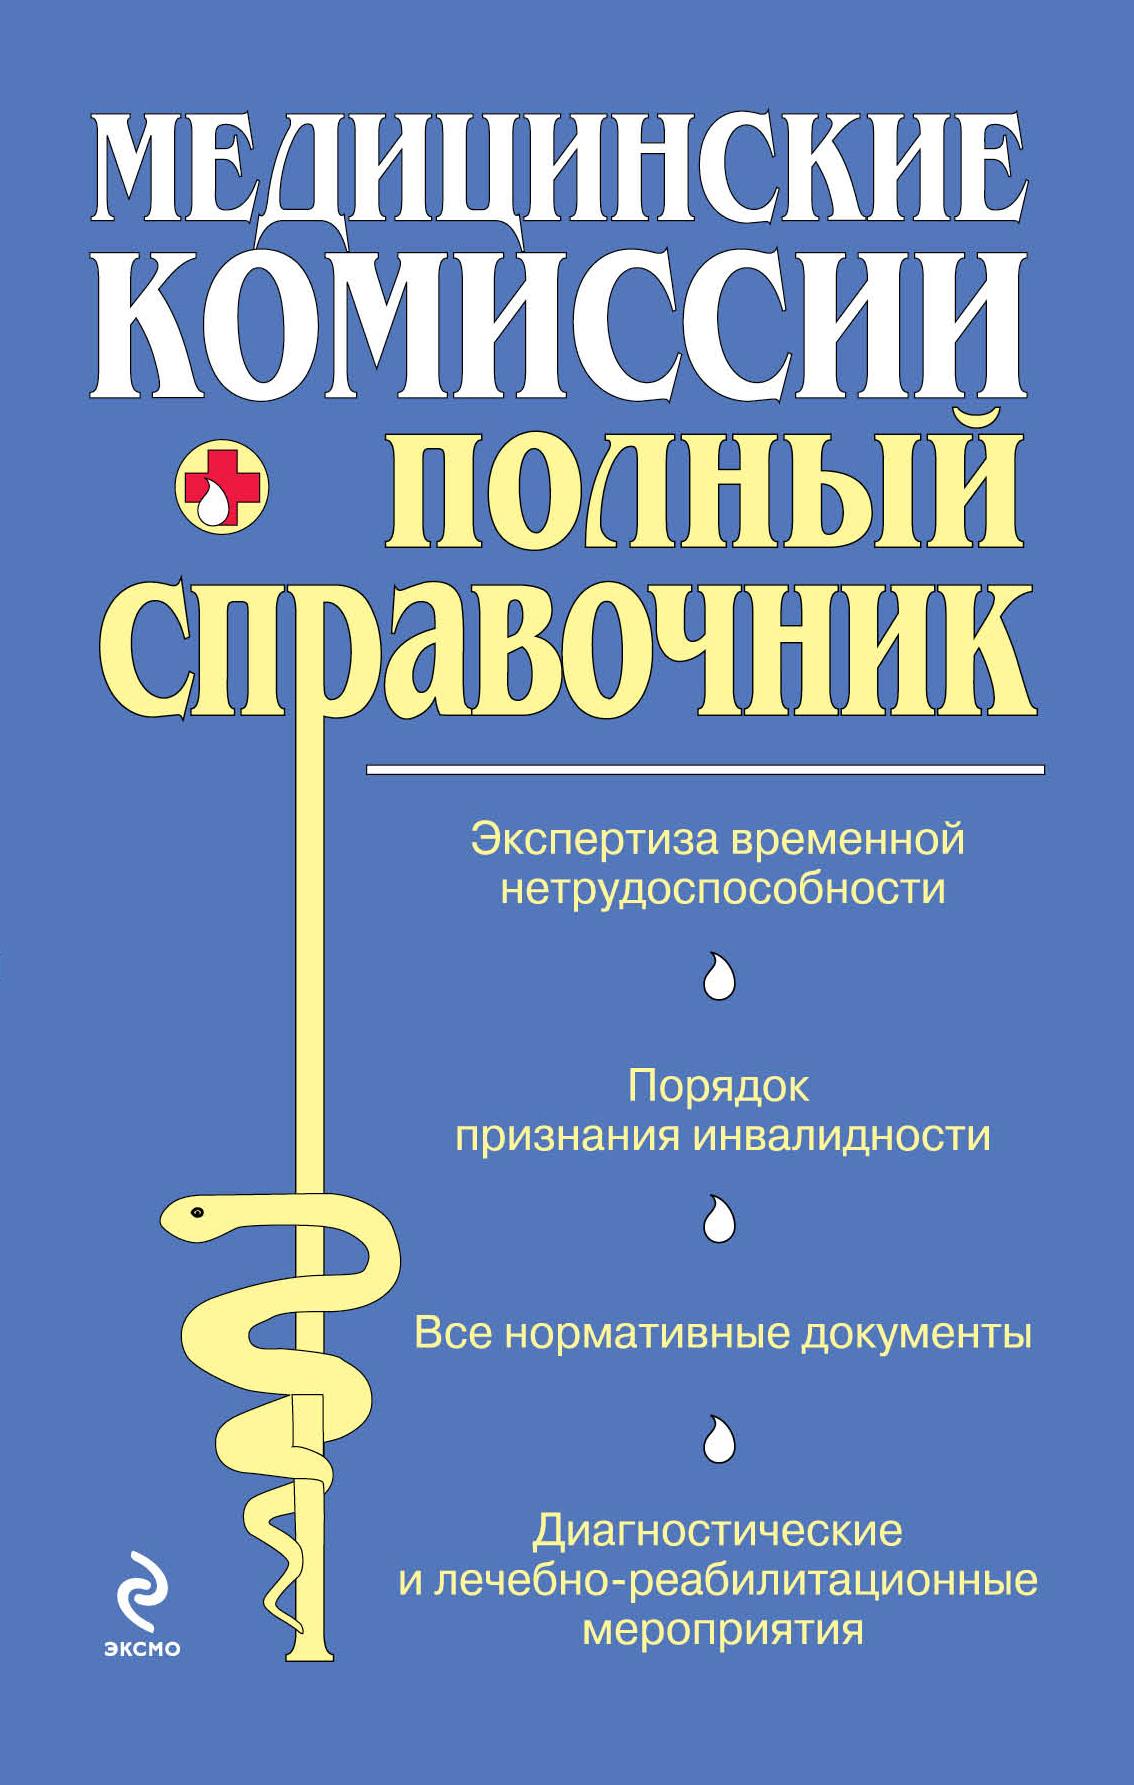 Медицинские комиссии